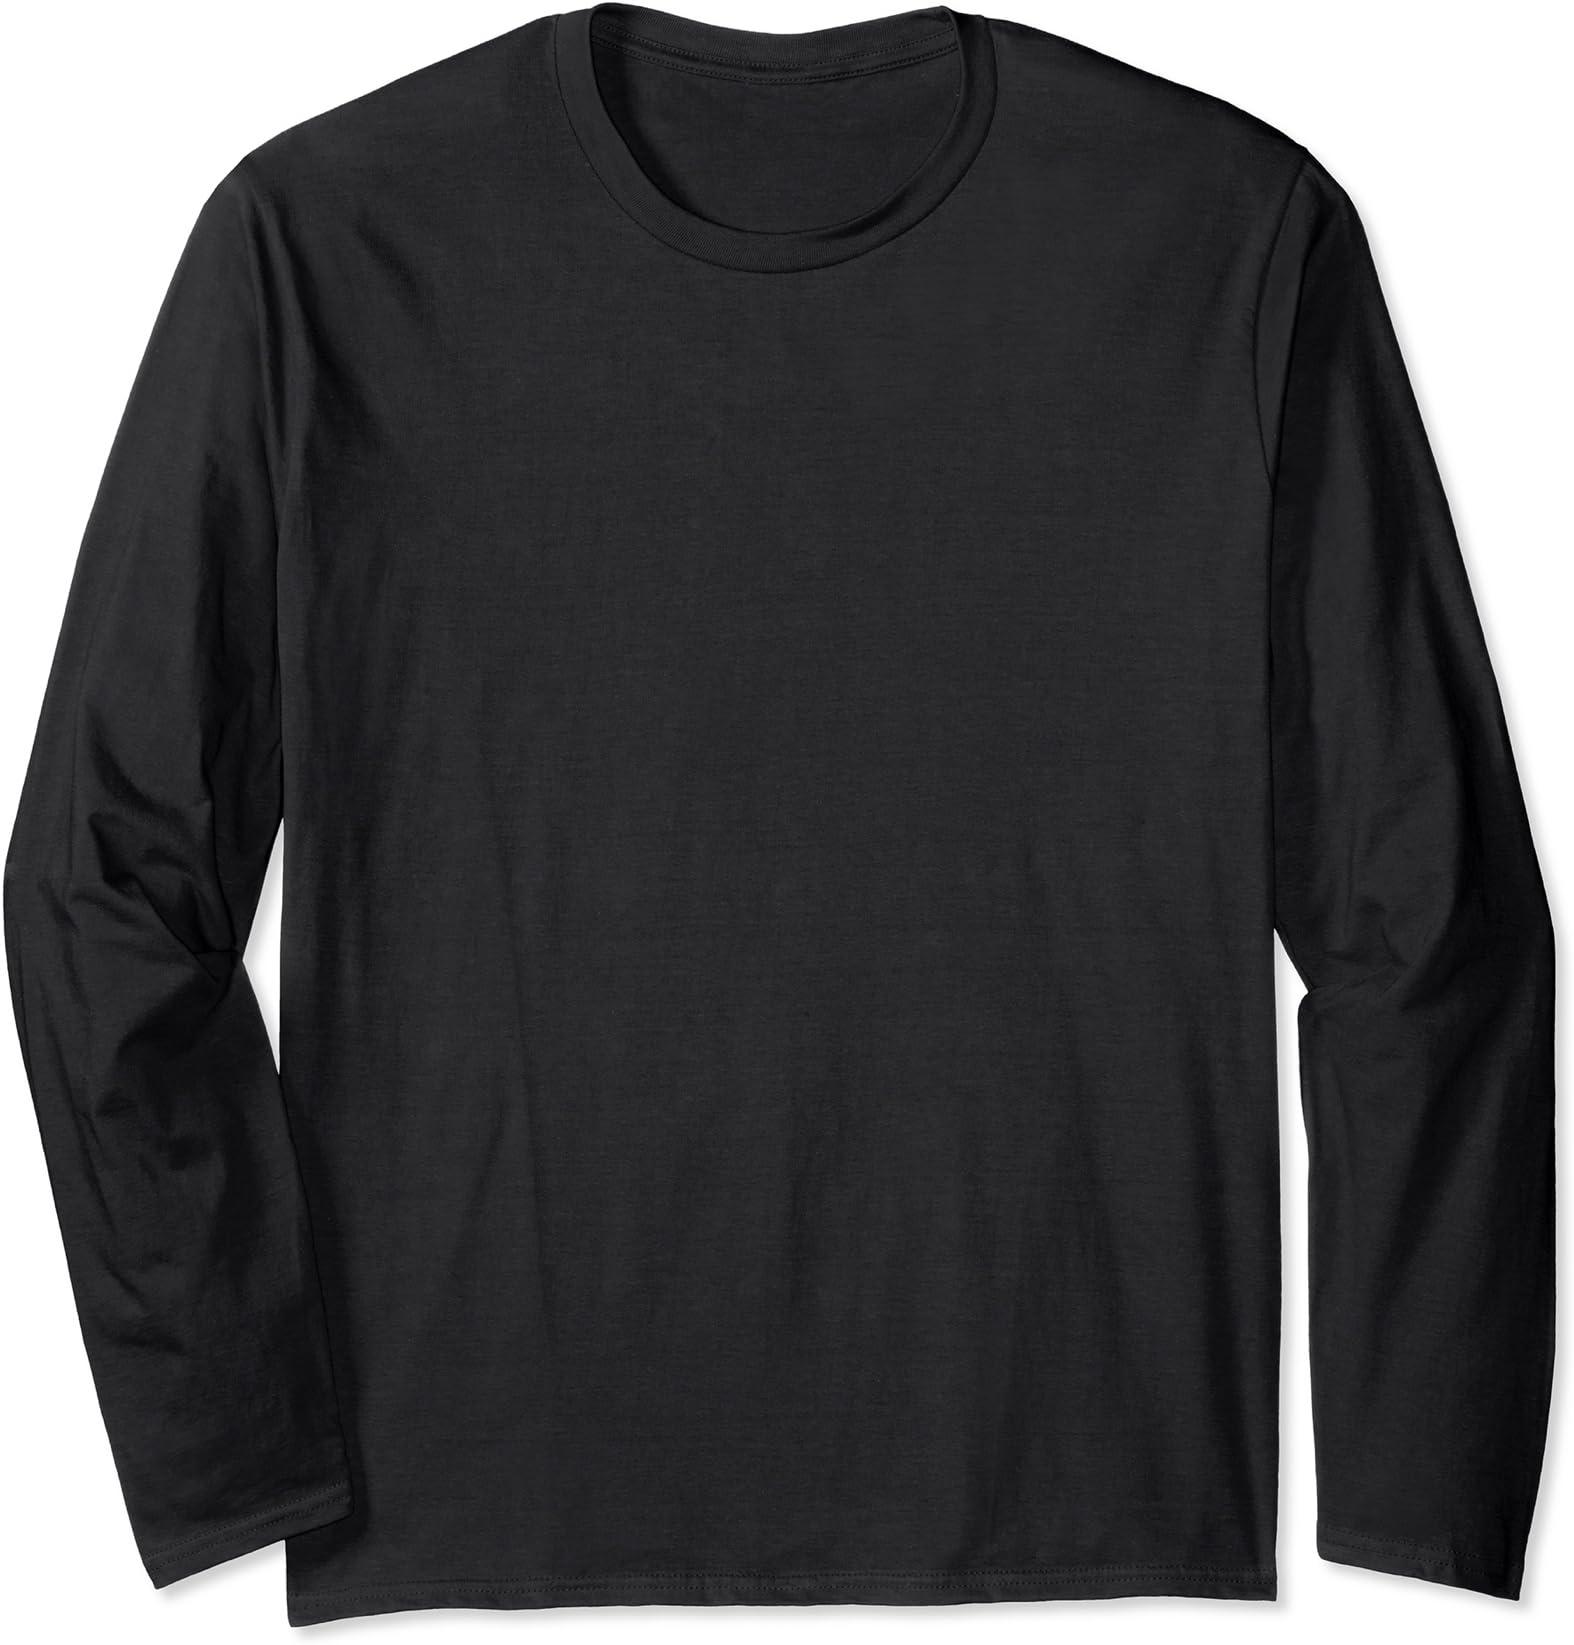 Comical Shirt Mens Peace and Love Sweatshirt